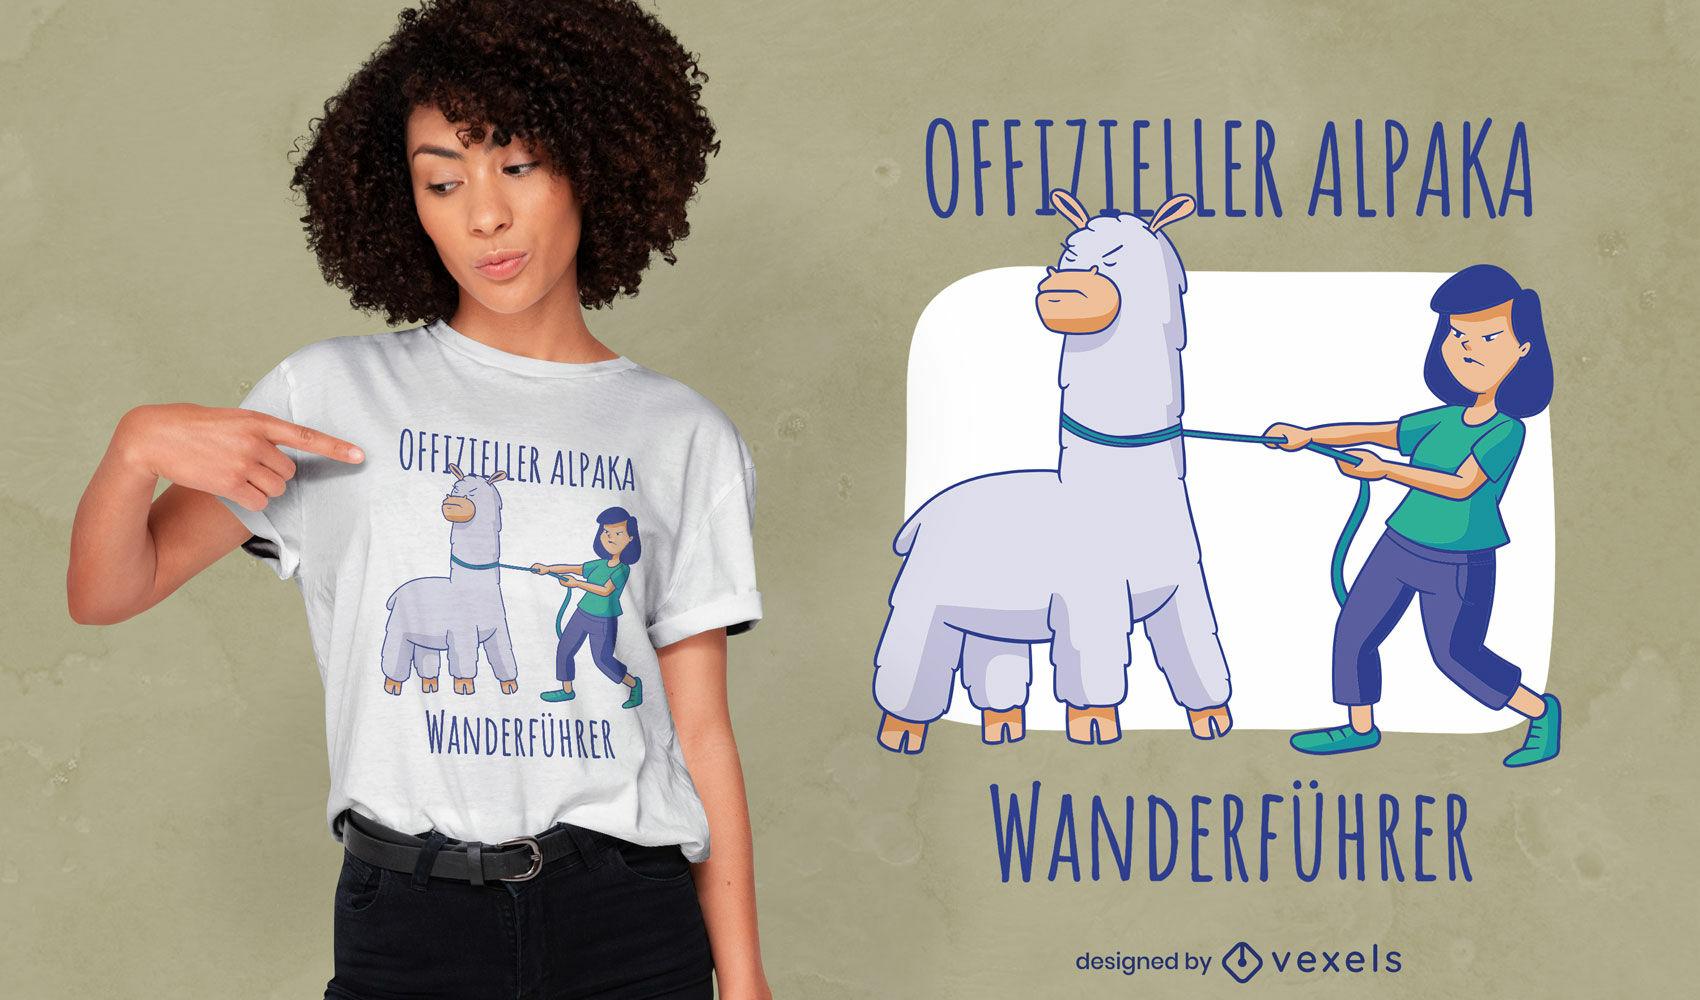 Tamed alpaca german quote t-shirt design